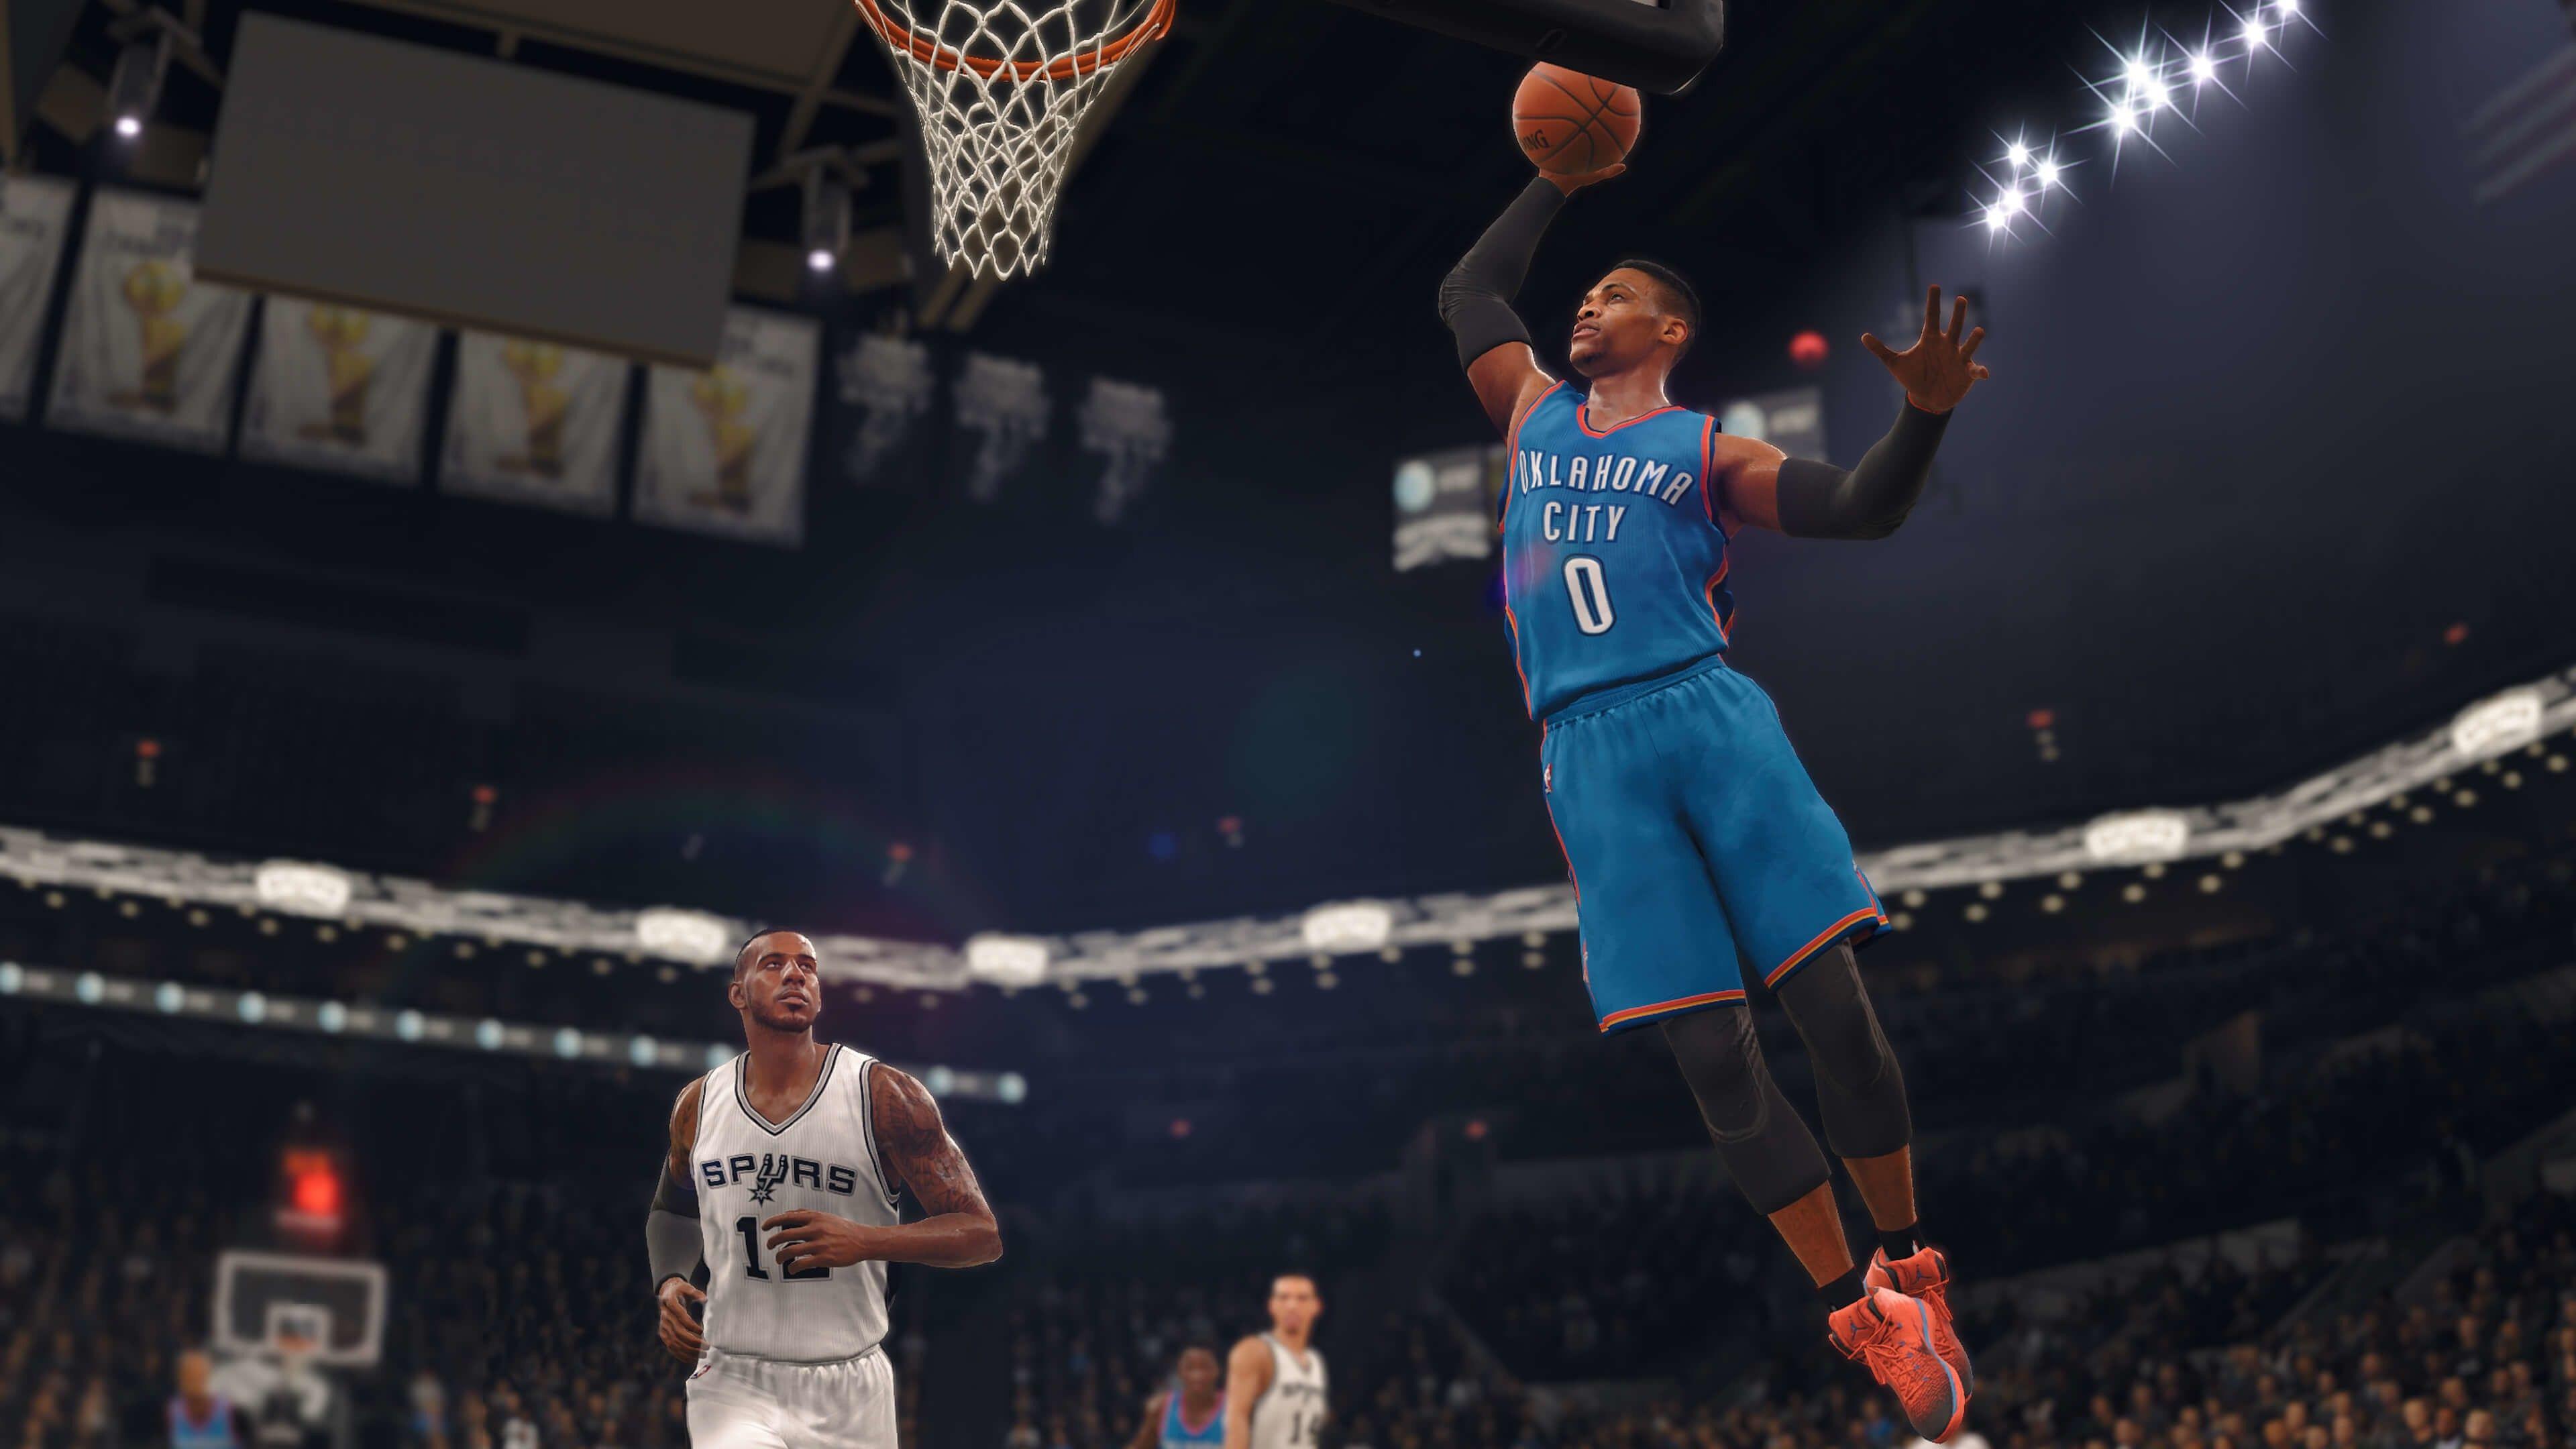 NBA 4K Wallpapers   Top NBA 4K Backgrounds   WallpaperAccess 3840x2160